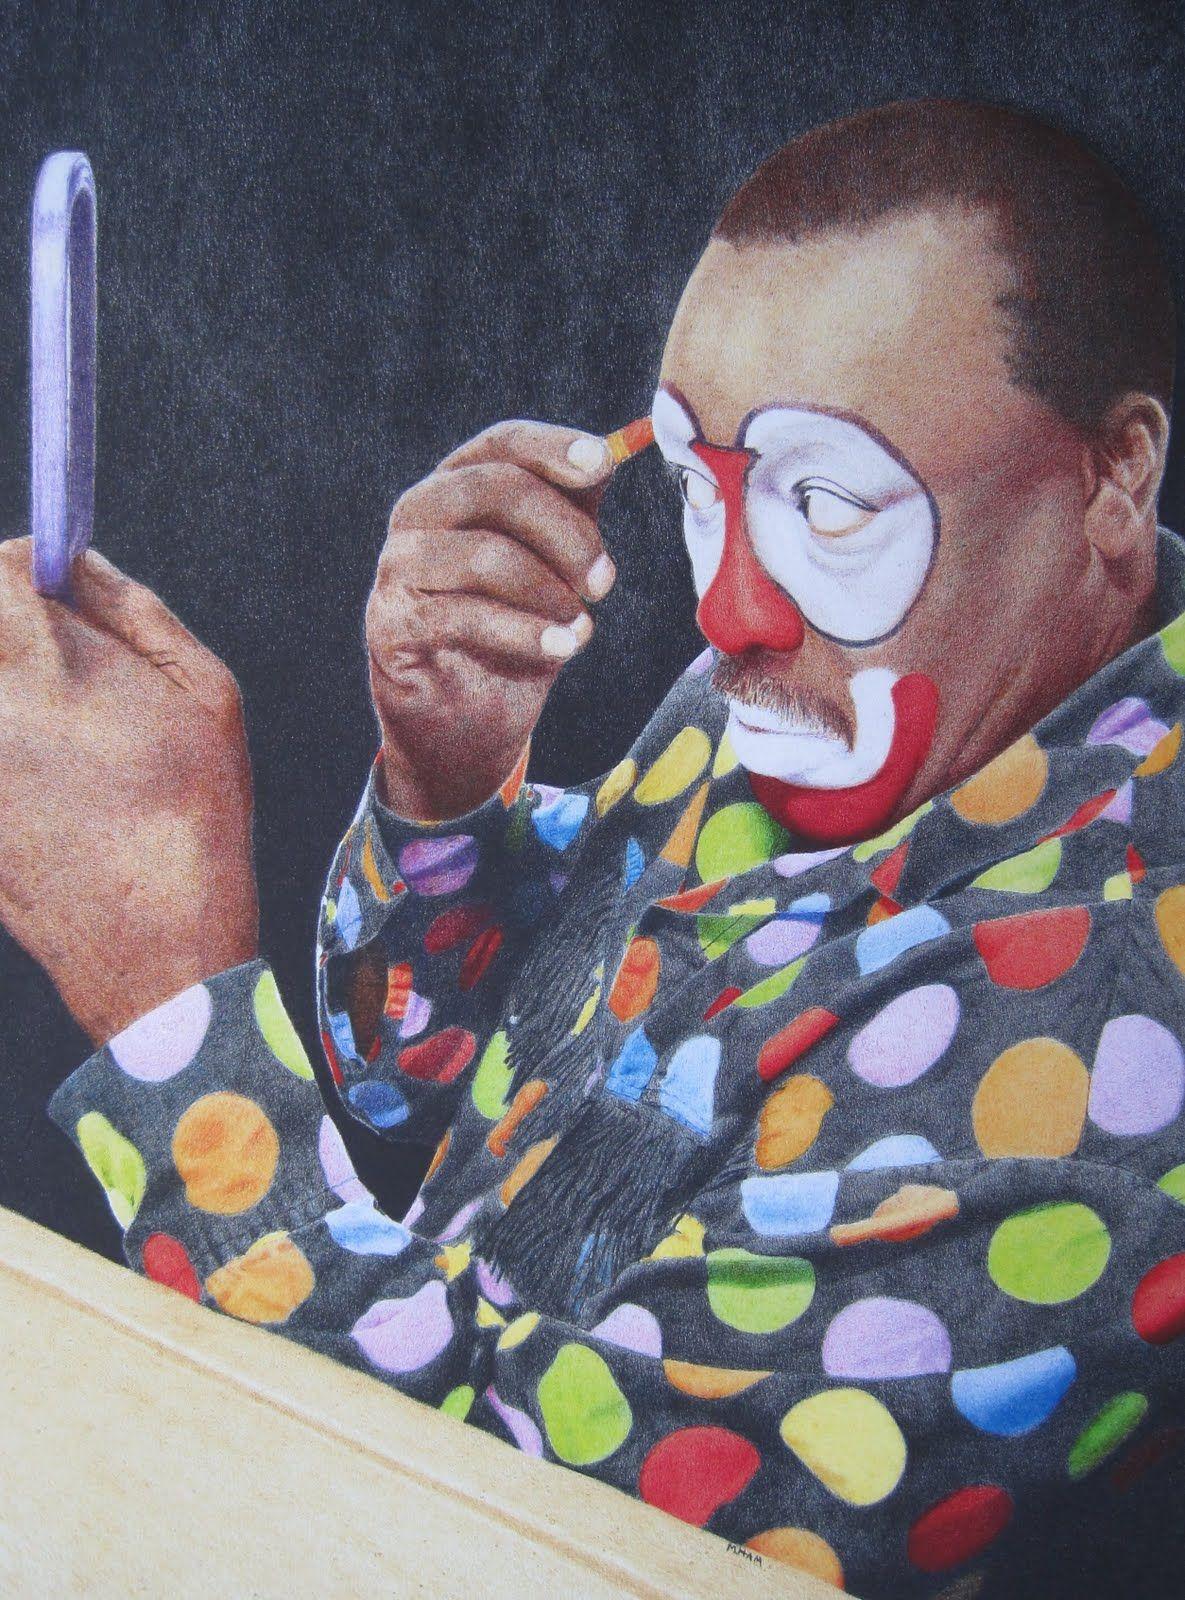 M hams art san antonio rodeo art famous clowns send